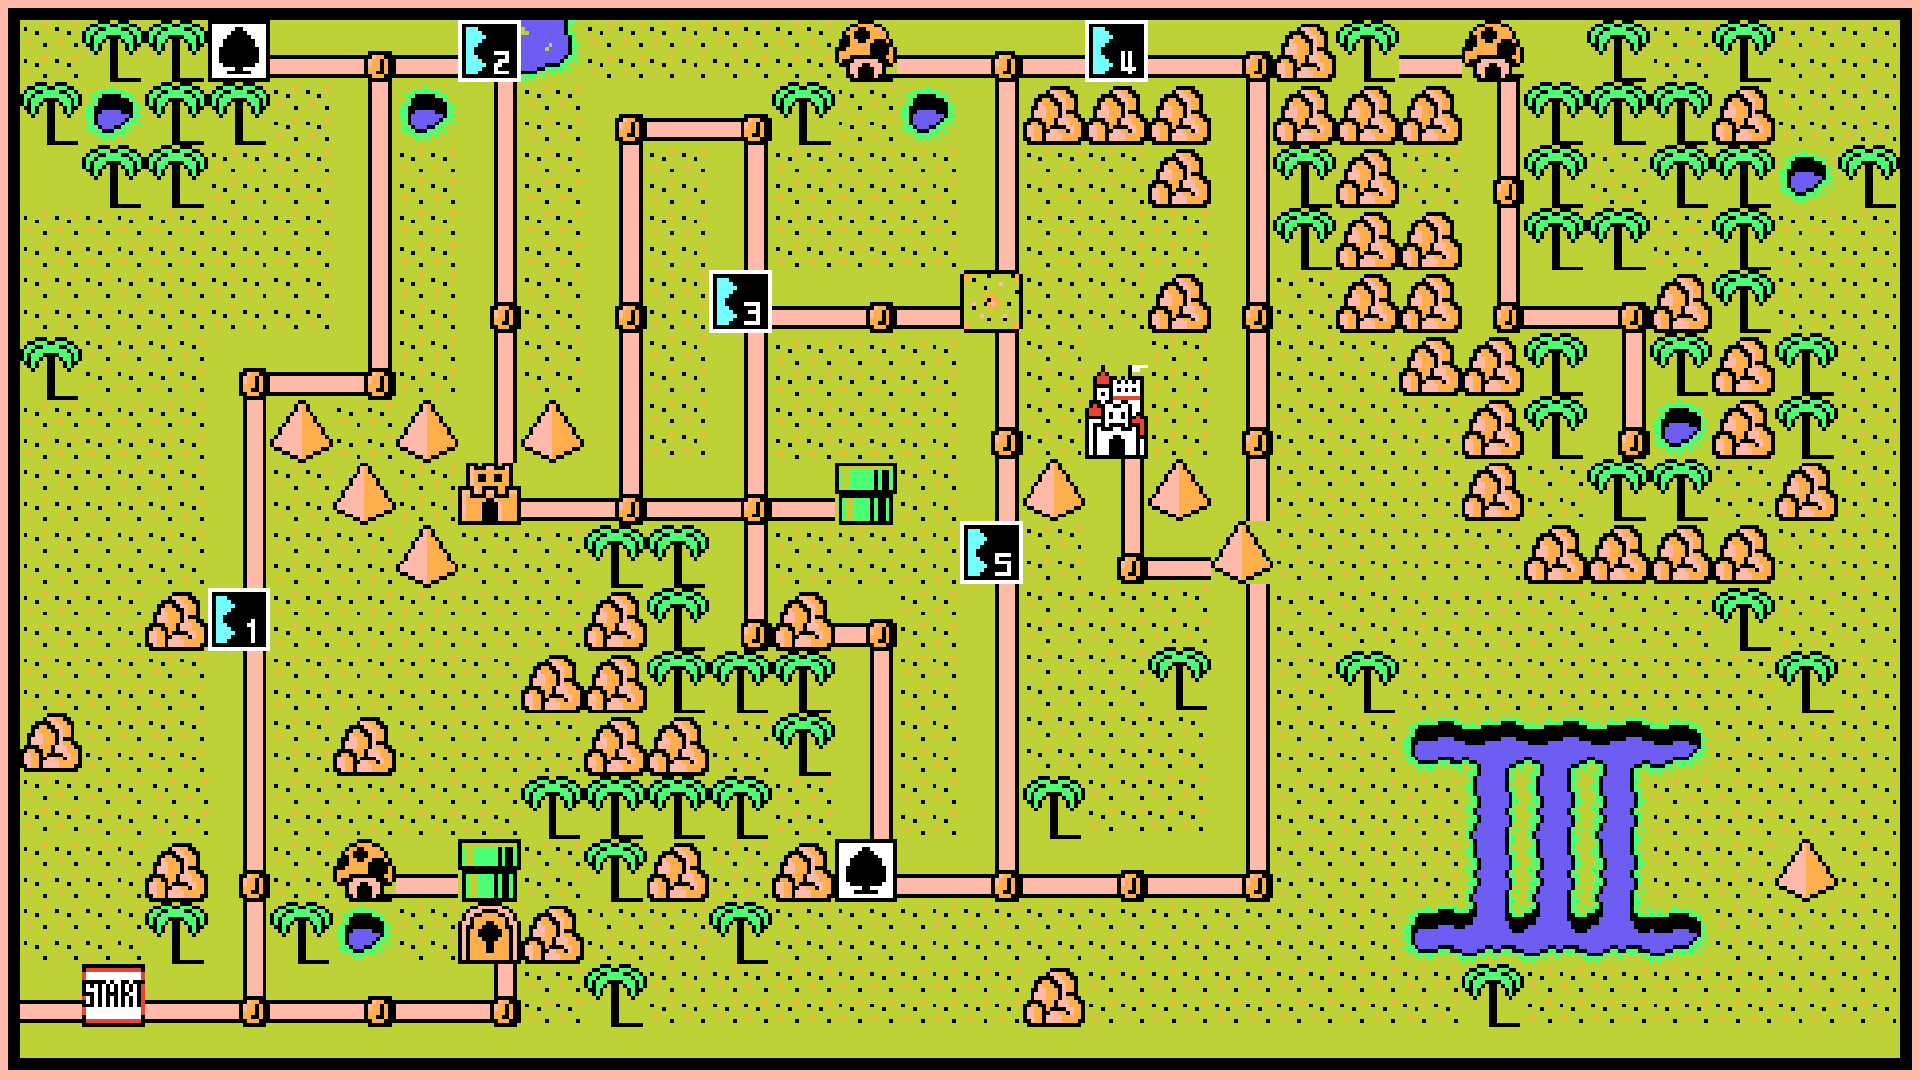 Super Mario Bros 3 Hd Wallpaper Background Image 1920x1080